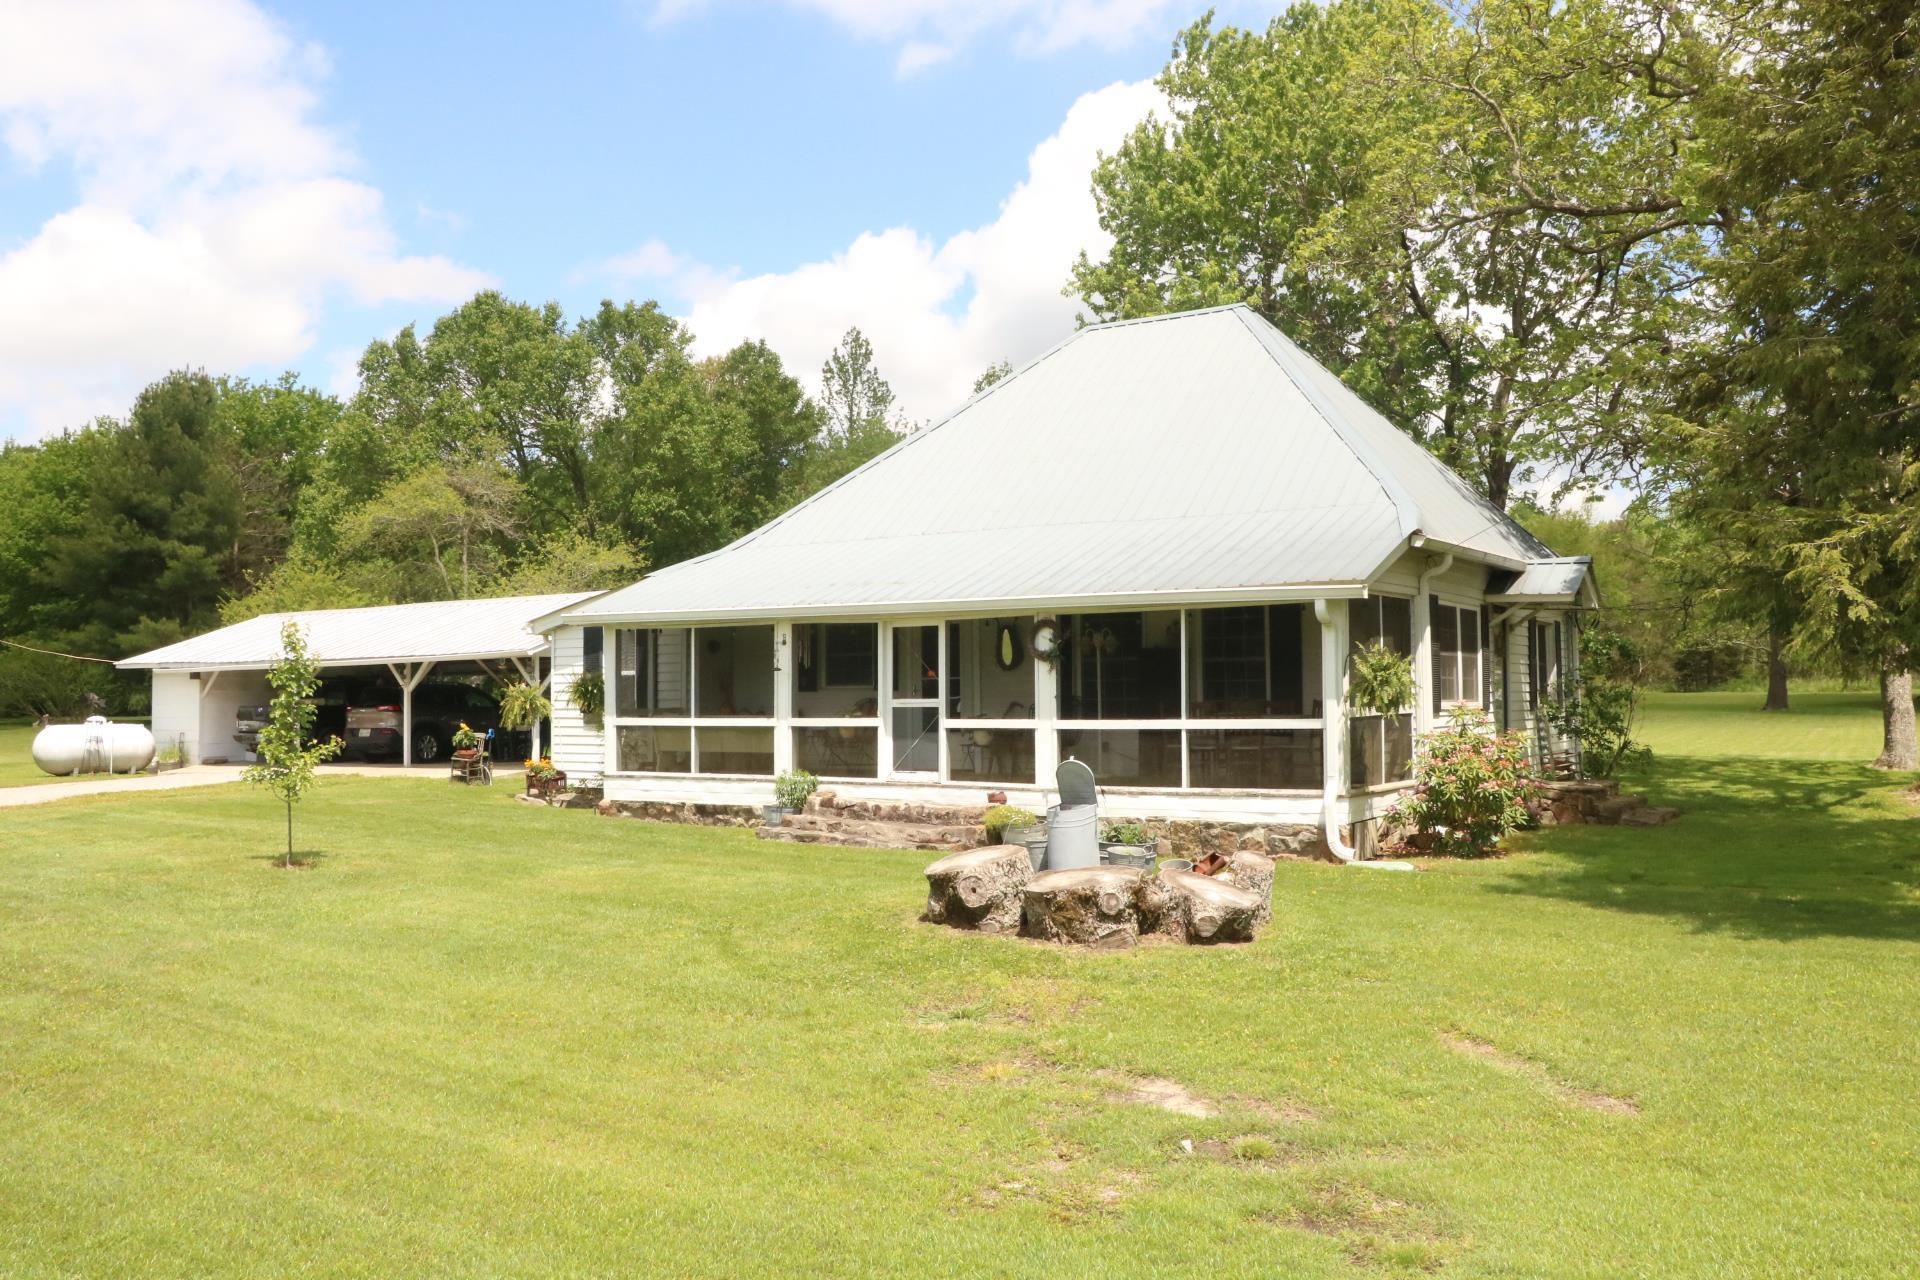 26 7Th Ave, Coalmont, TN 37313 - Coalmont, TN real estate listing